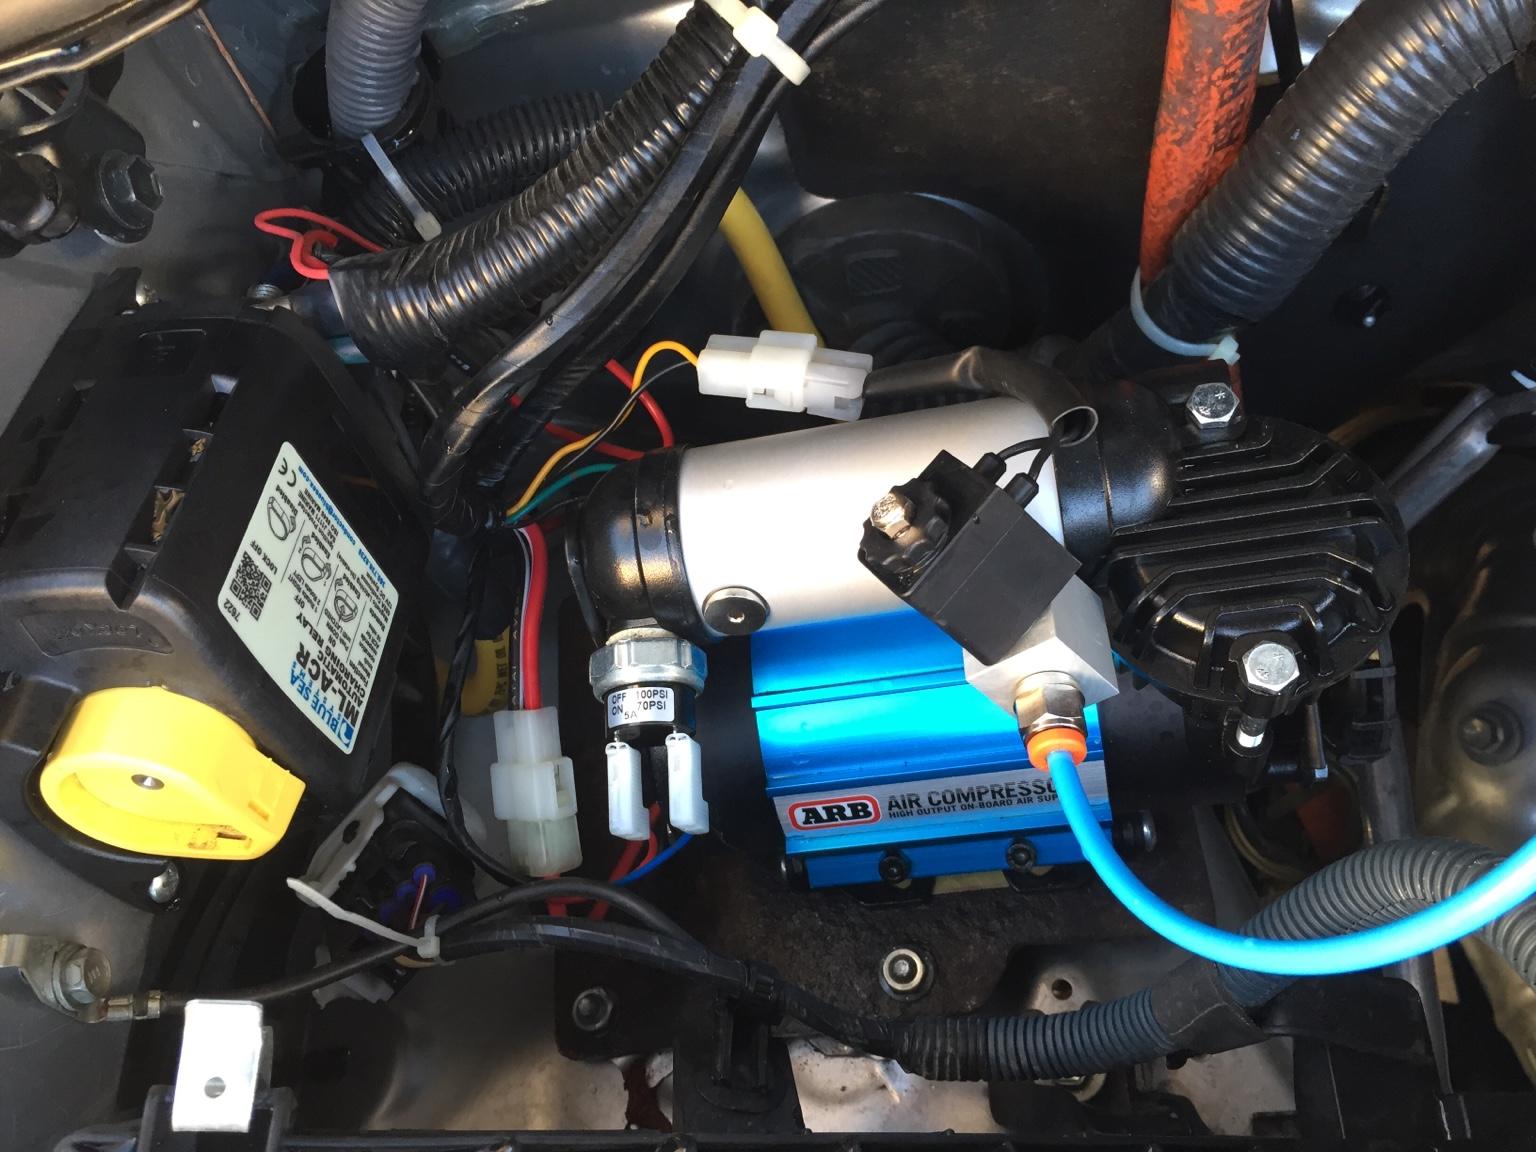 Fs2015 Toyota 4runner Trail Premium W Kdss San Luis Obispo Ca Arb Air Compressor Wiring Diagram Http Wwwpradopointcom Showthread 60000 Obo